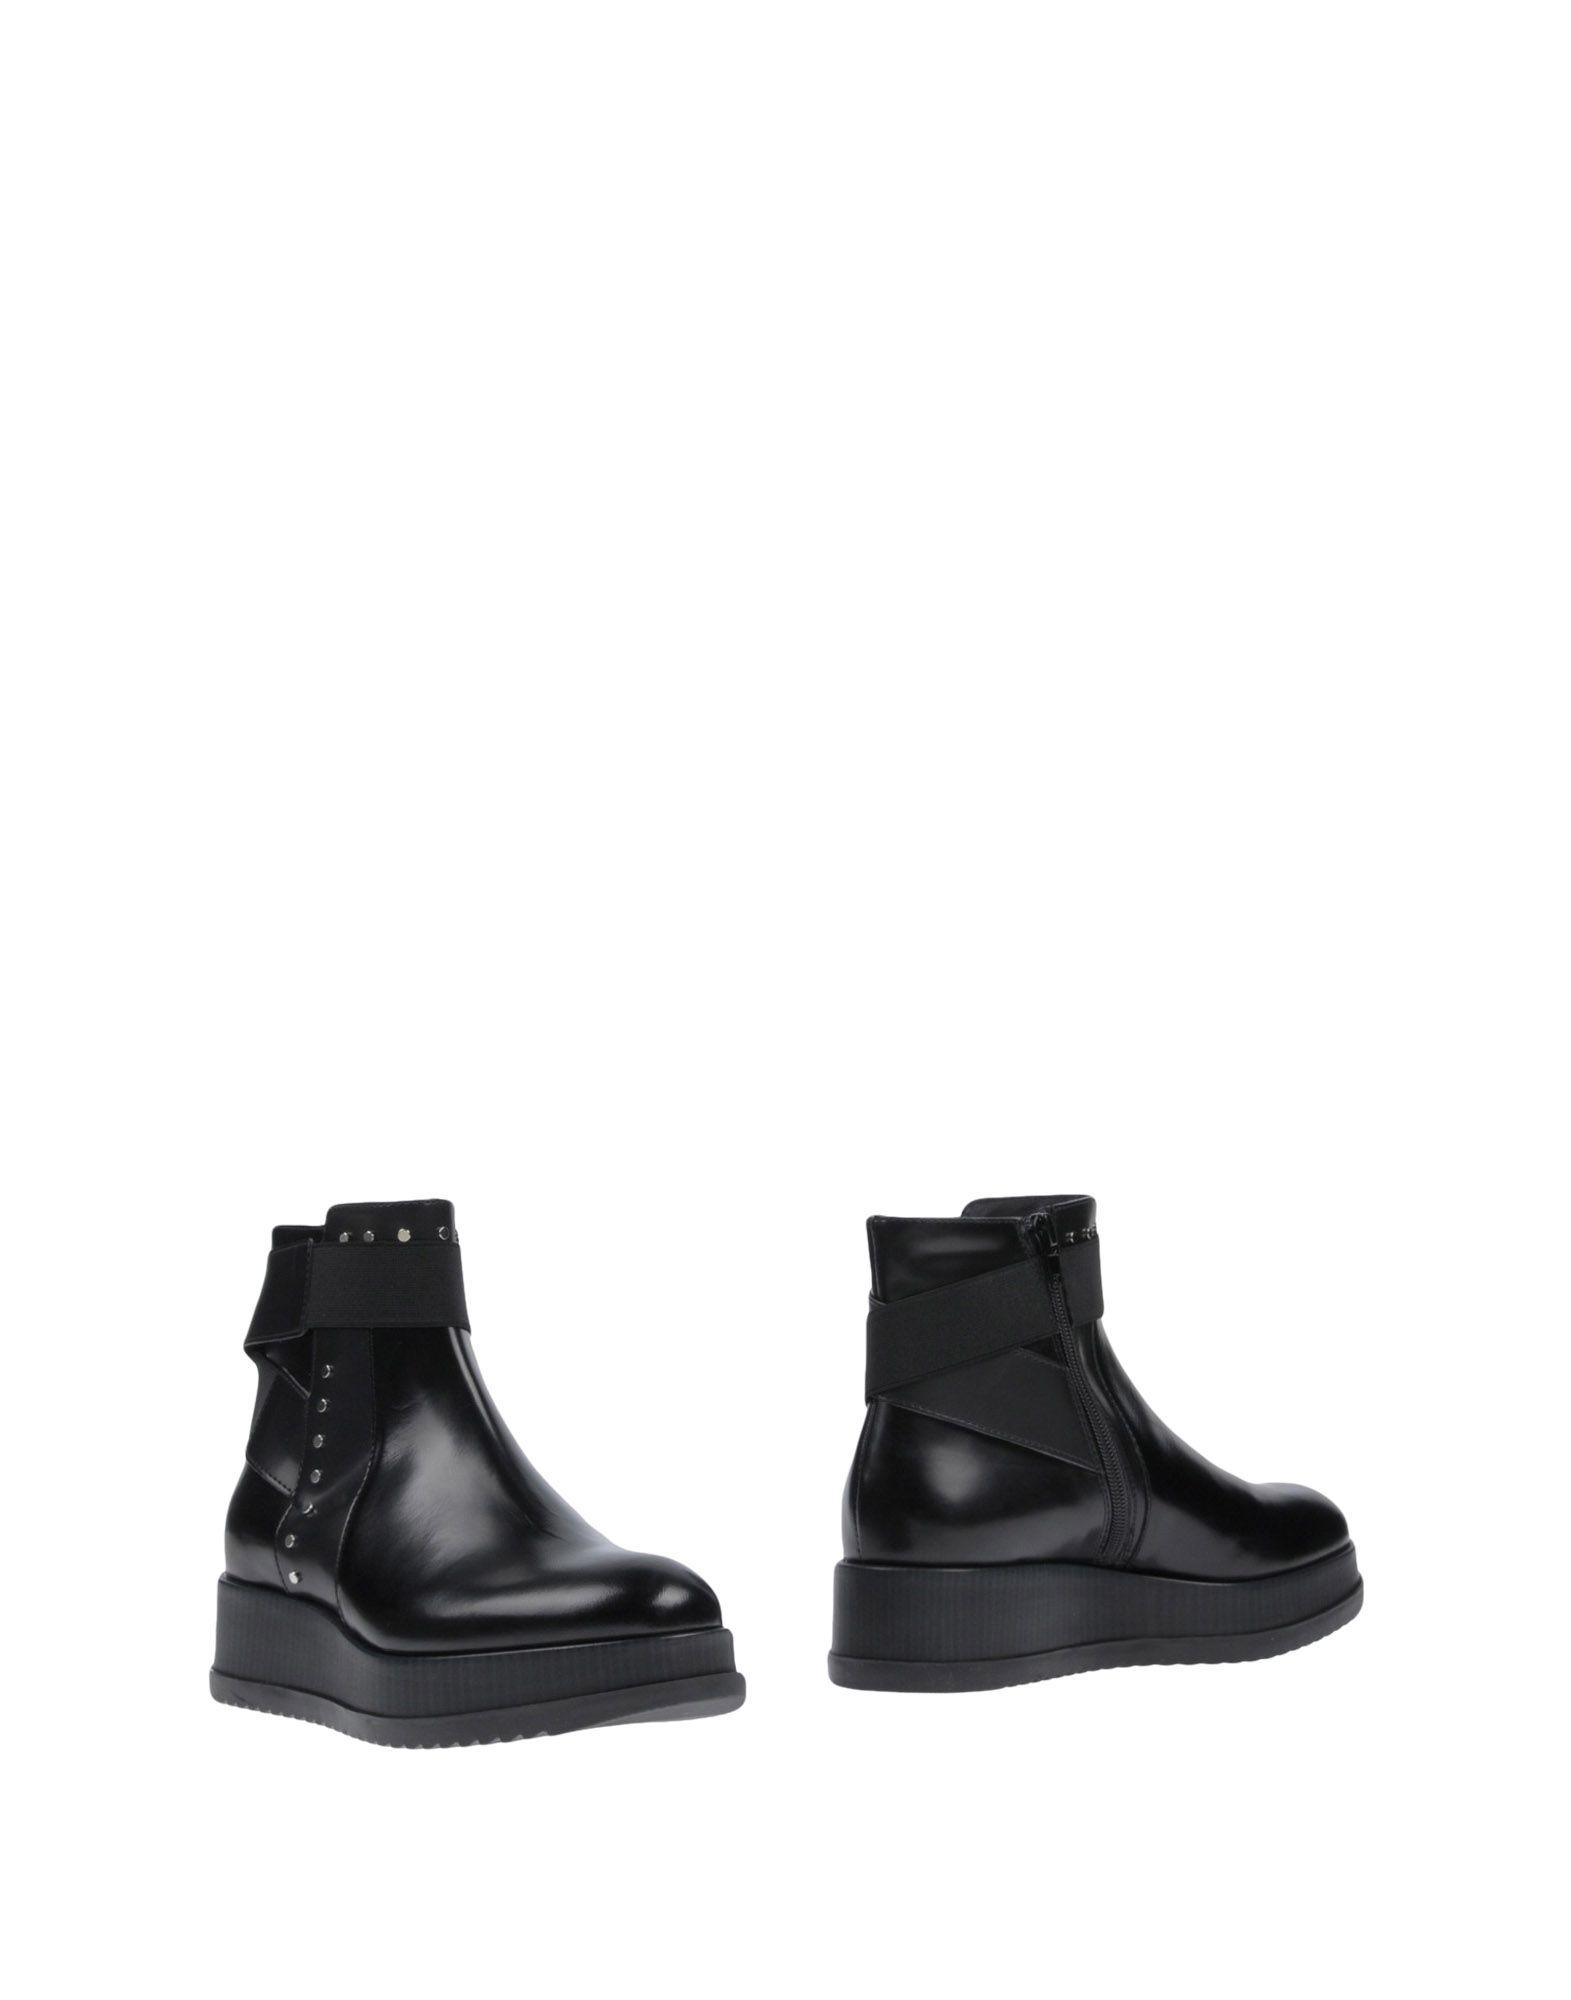 TOSCA BLU SHOES Полусапоги и высокие ботинки полусапоги tosca blu sf1602s032 black